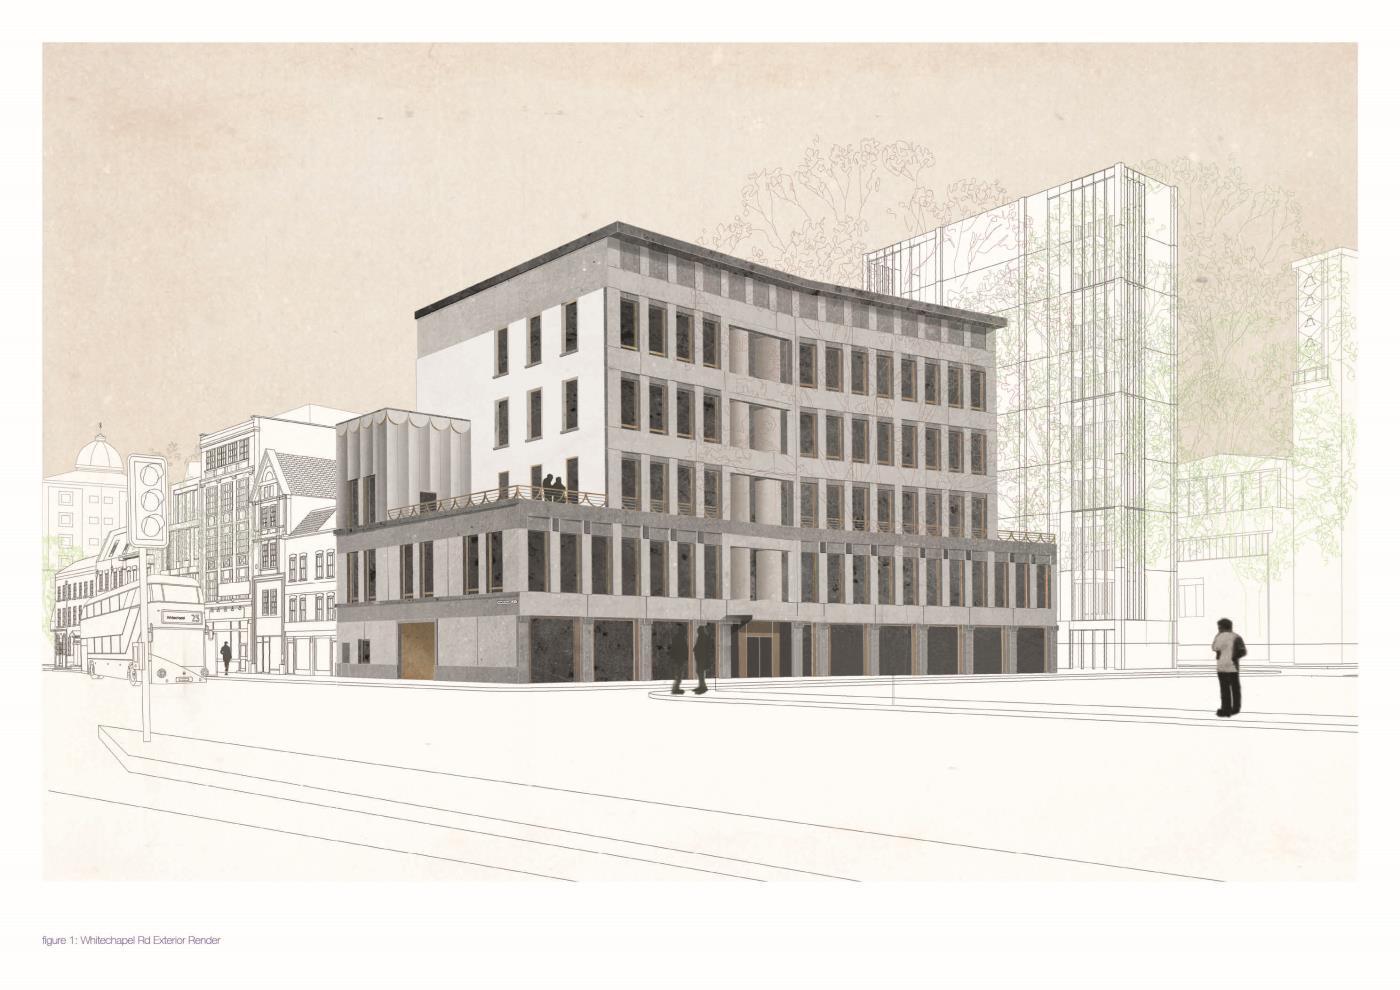 The Whitechapel Palazzo: A Gift to the City